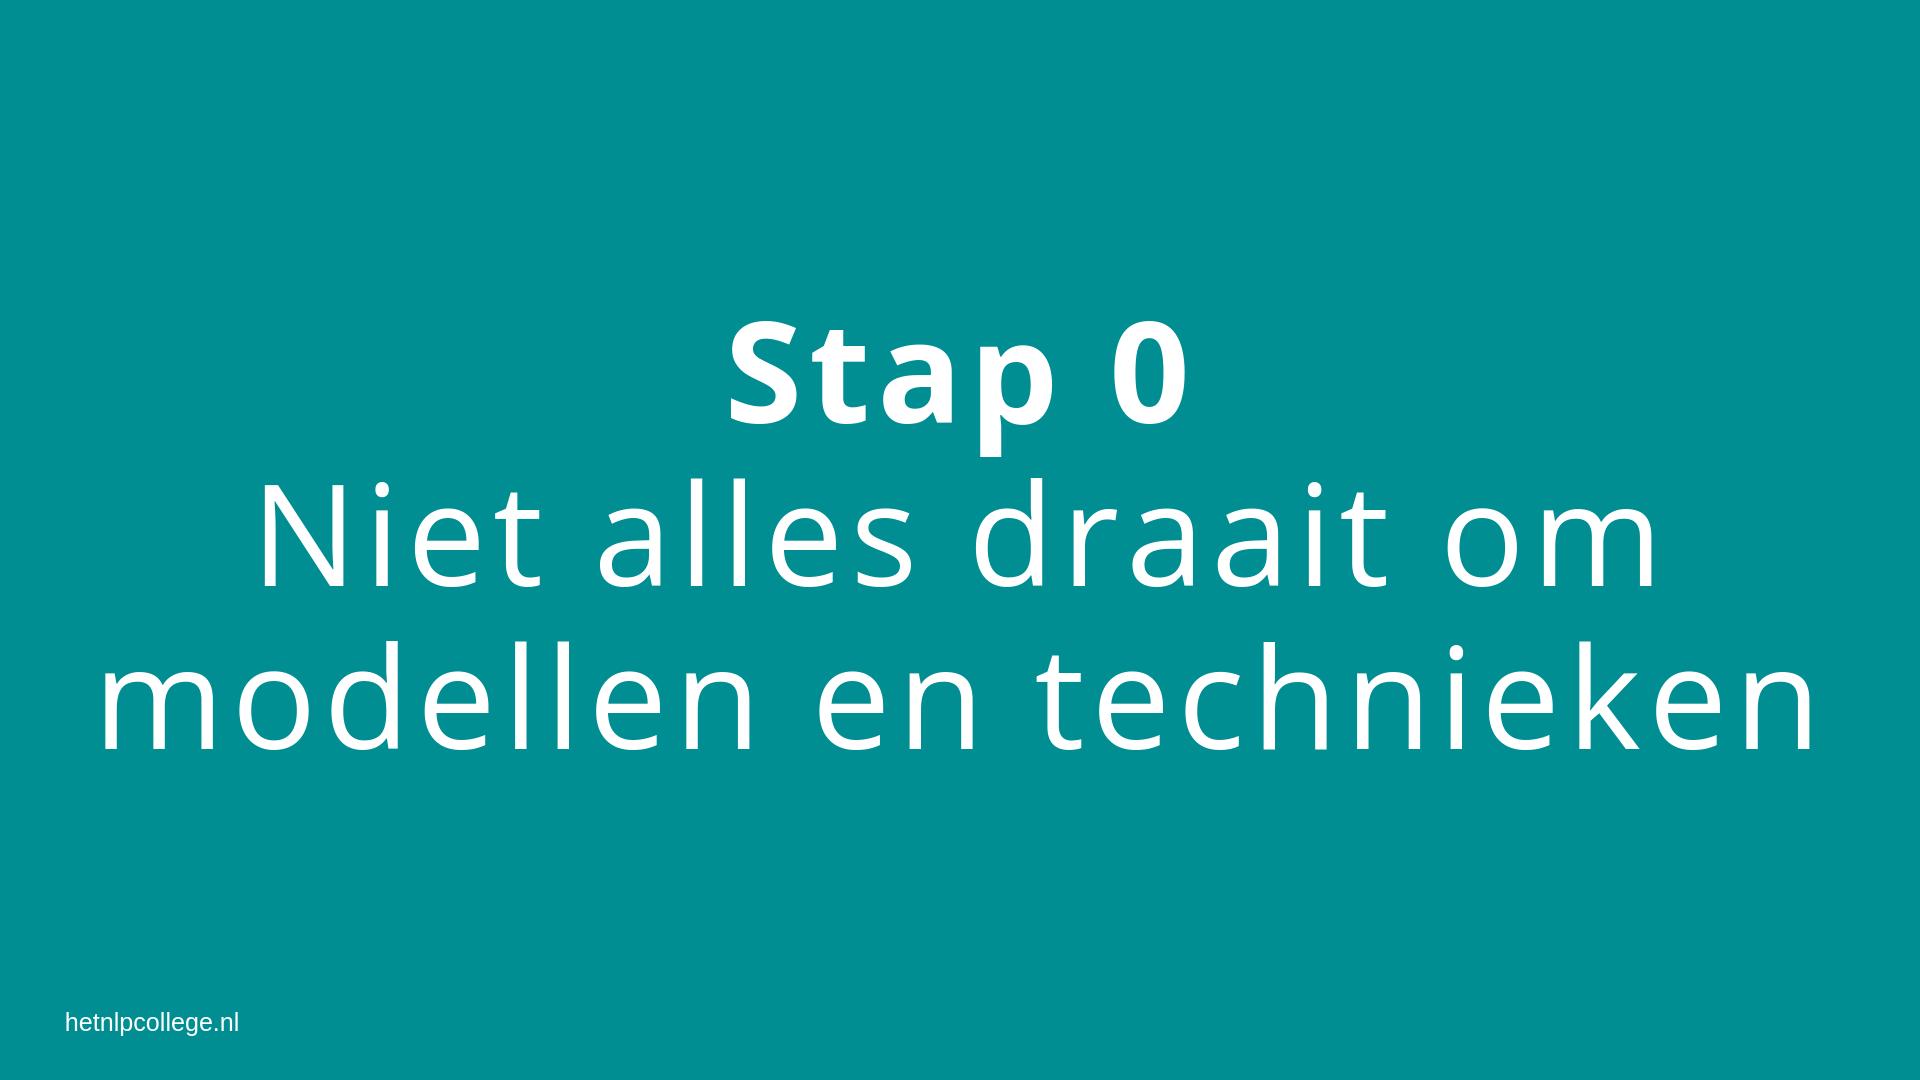 stap 0